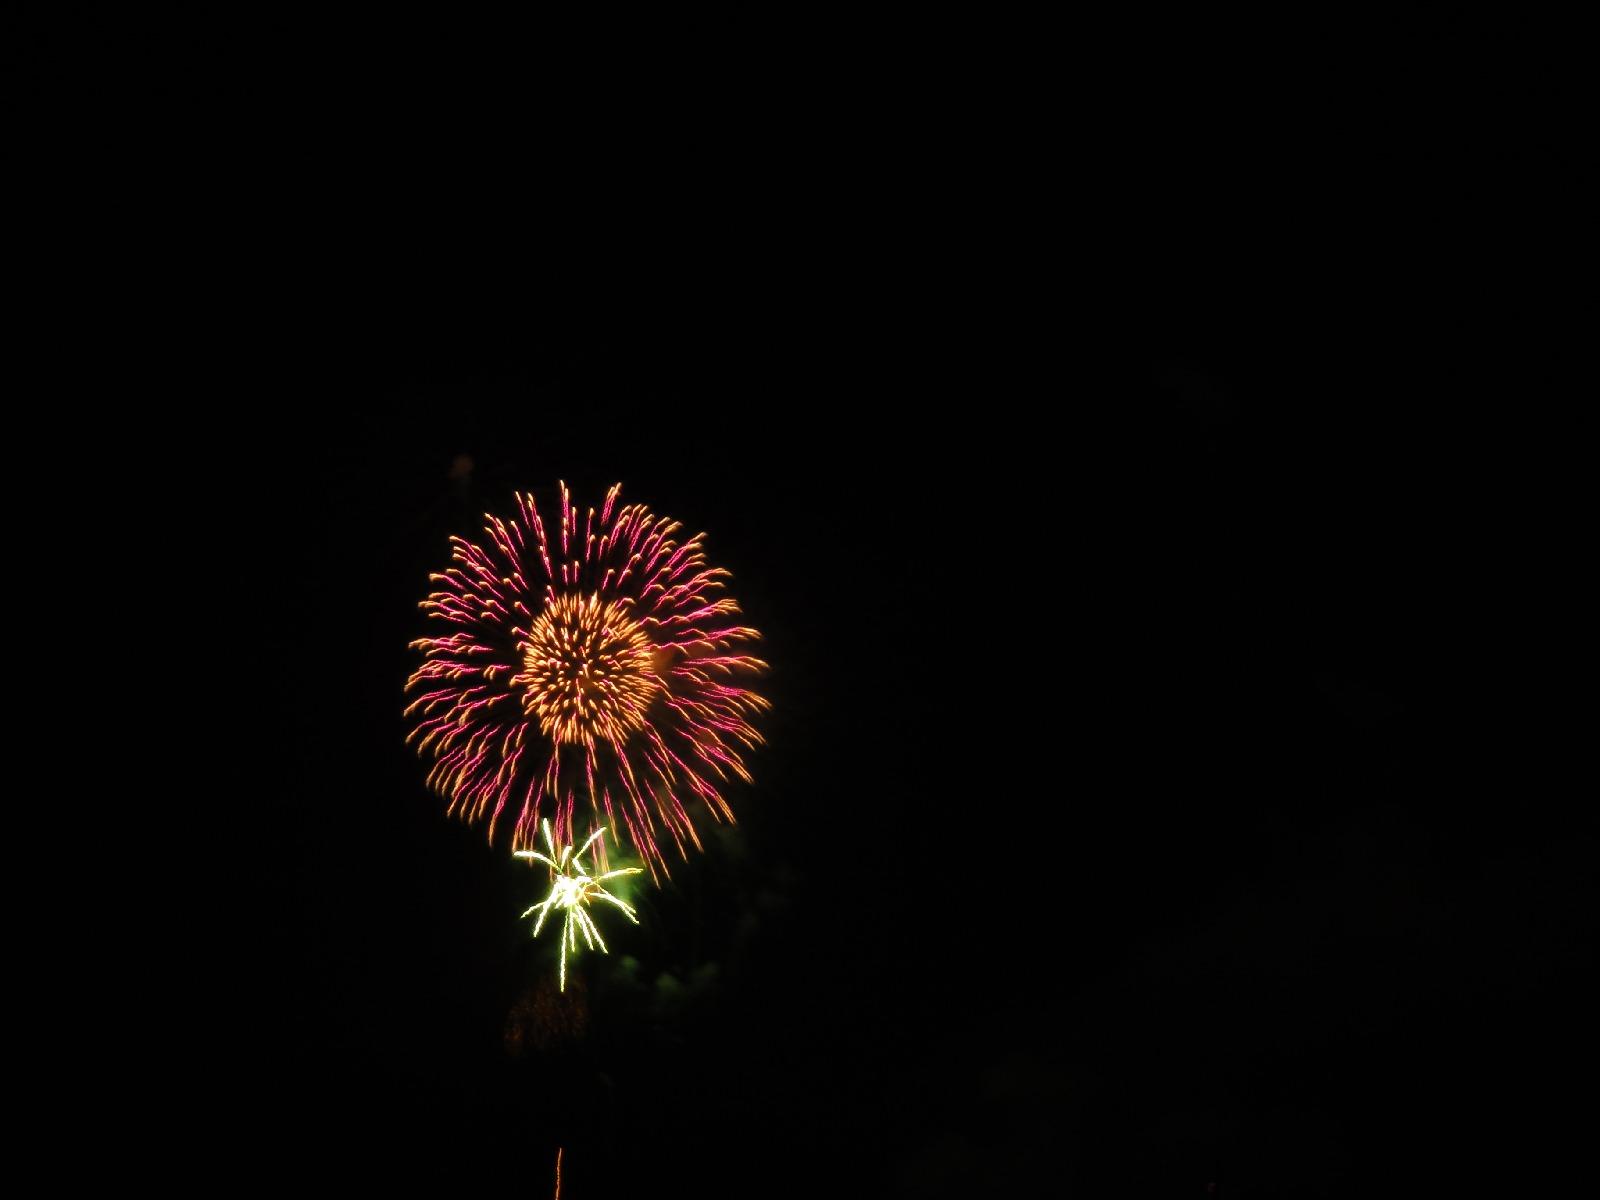 120728kasaokafireflower_034.jpg